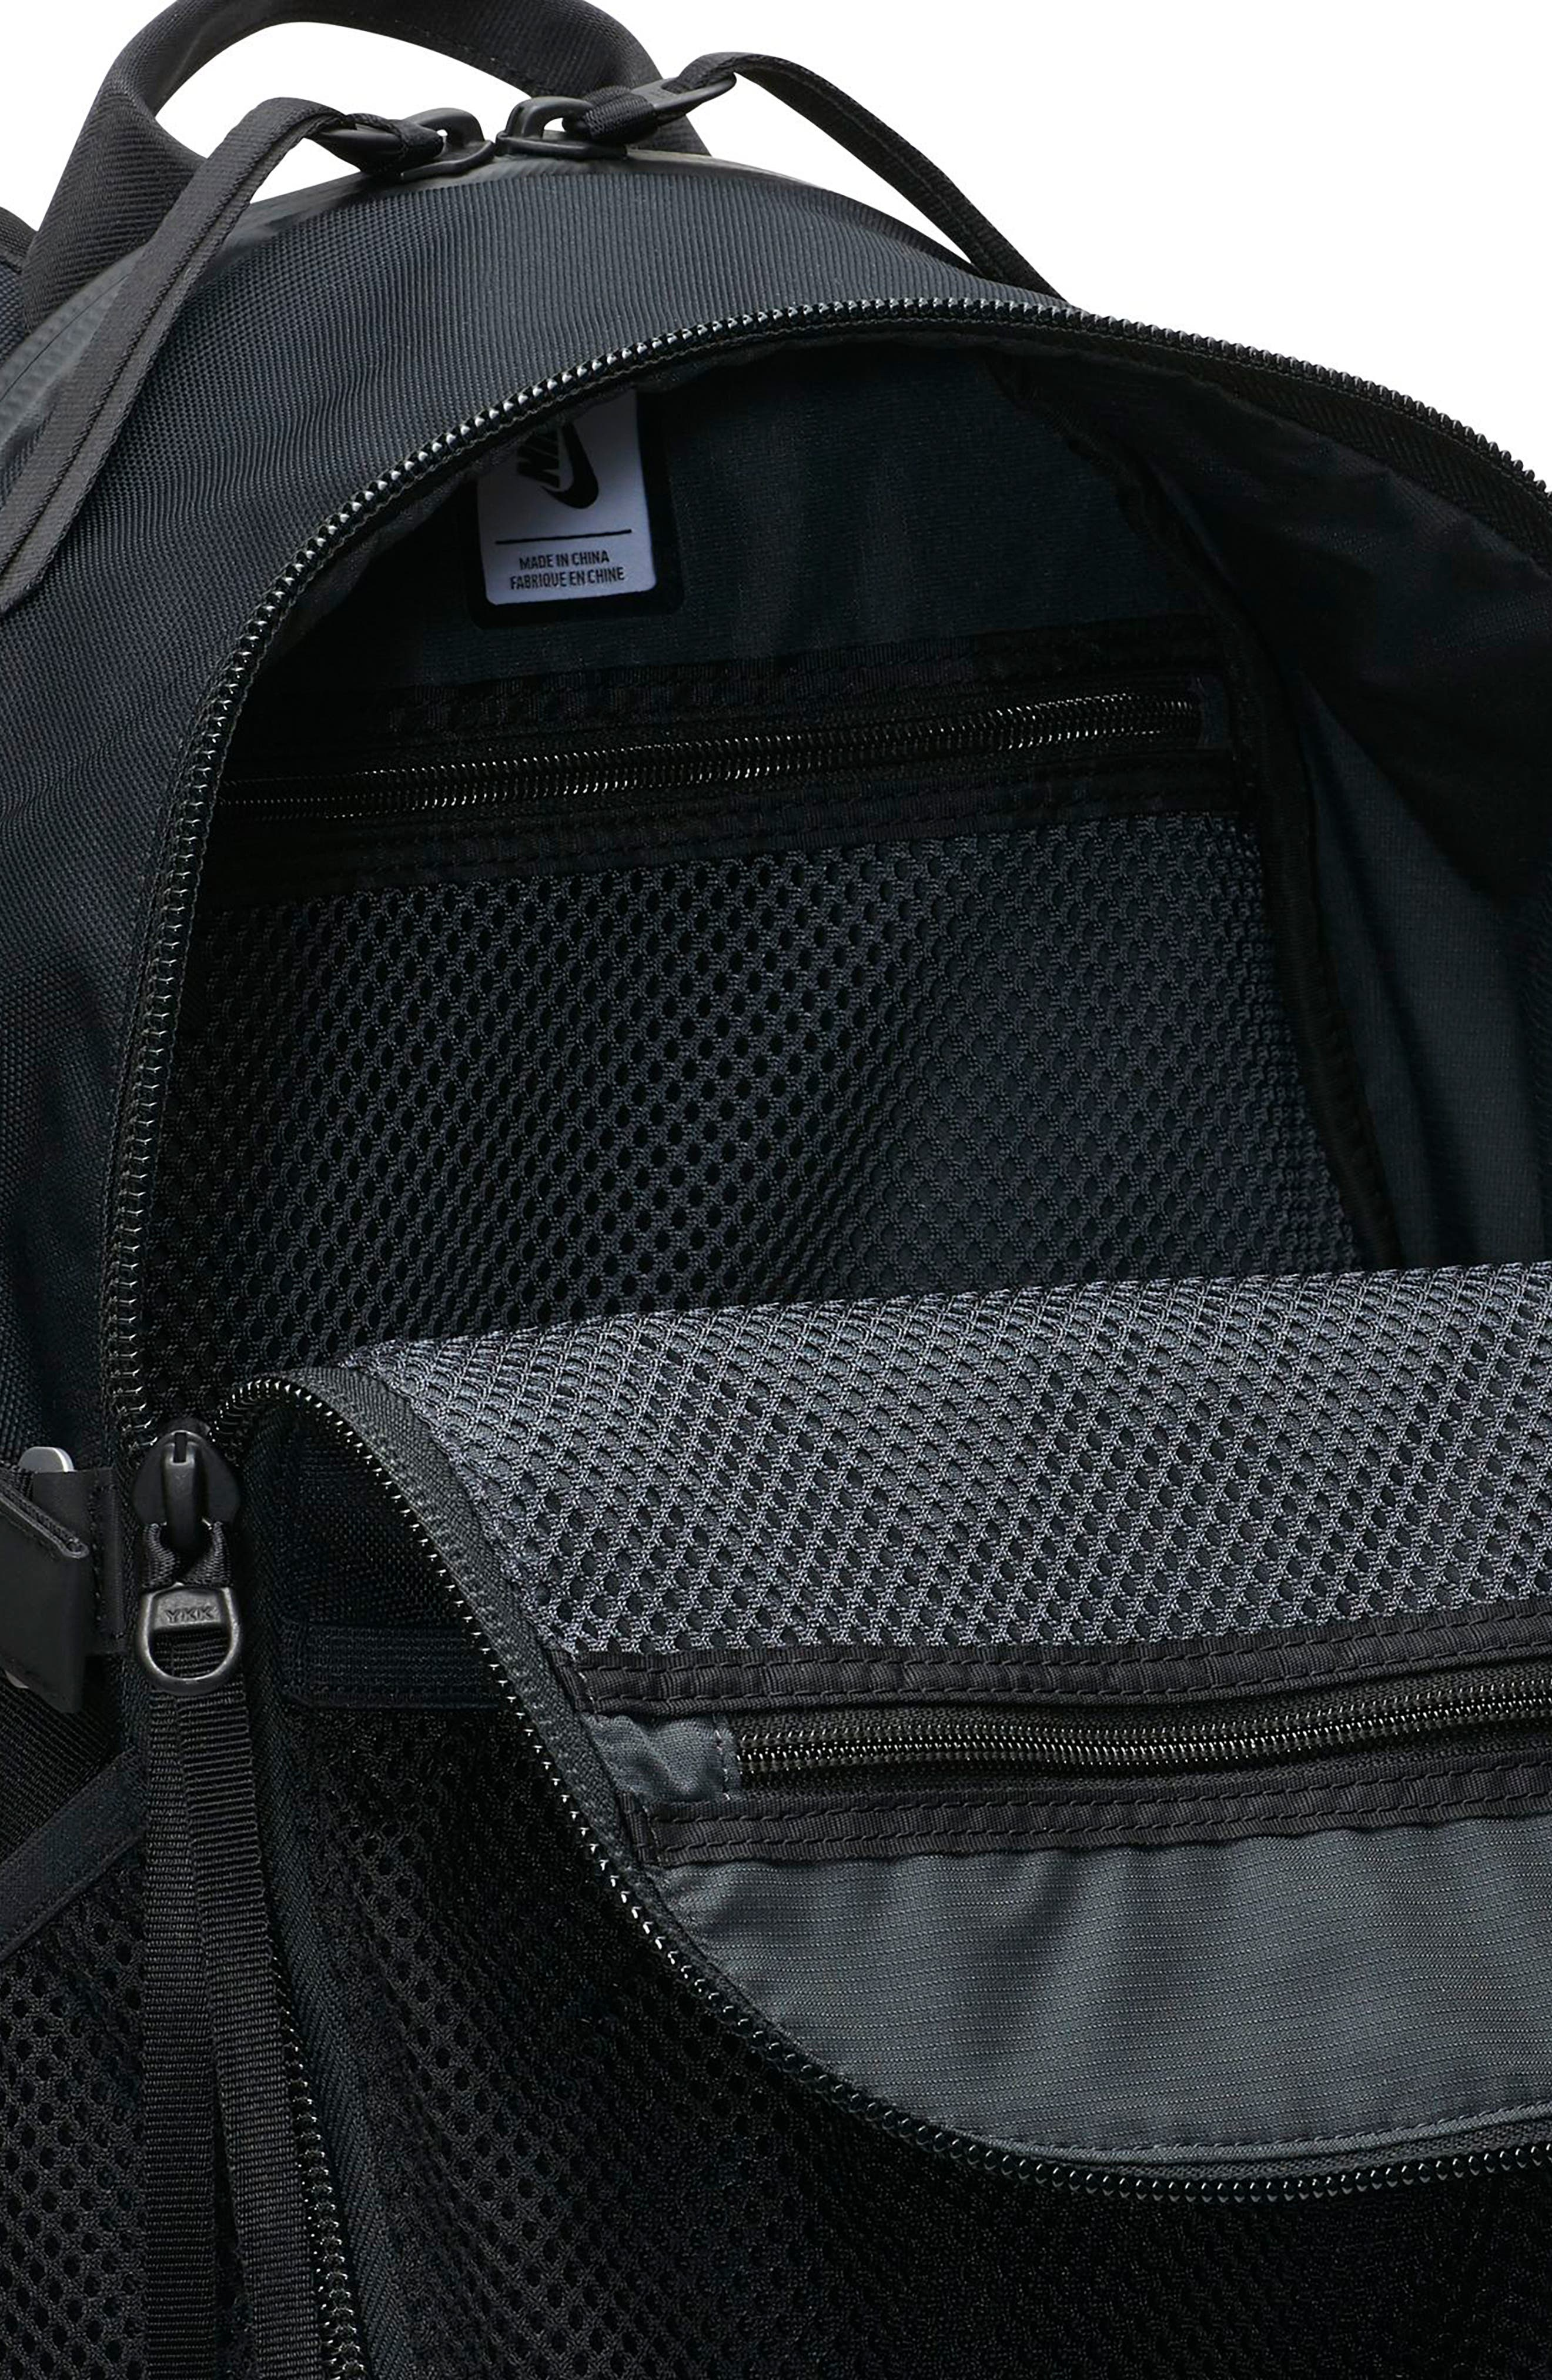 NikeLab Laptop Backpack,                             Alternate thumbnail 4, color,                             010